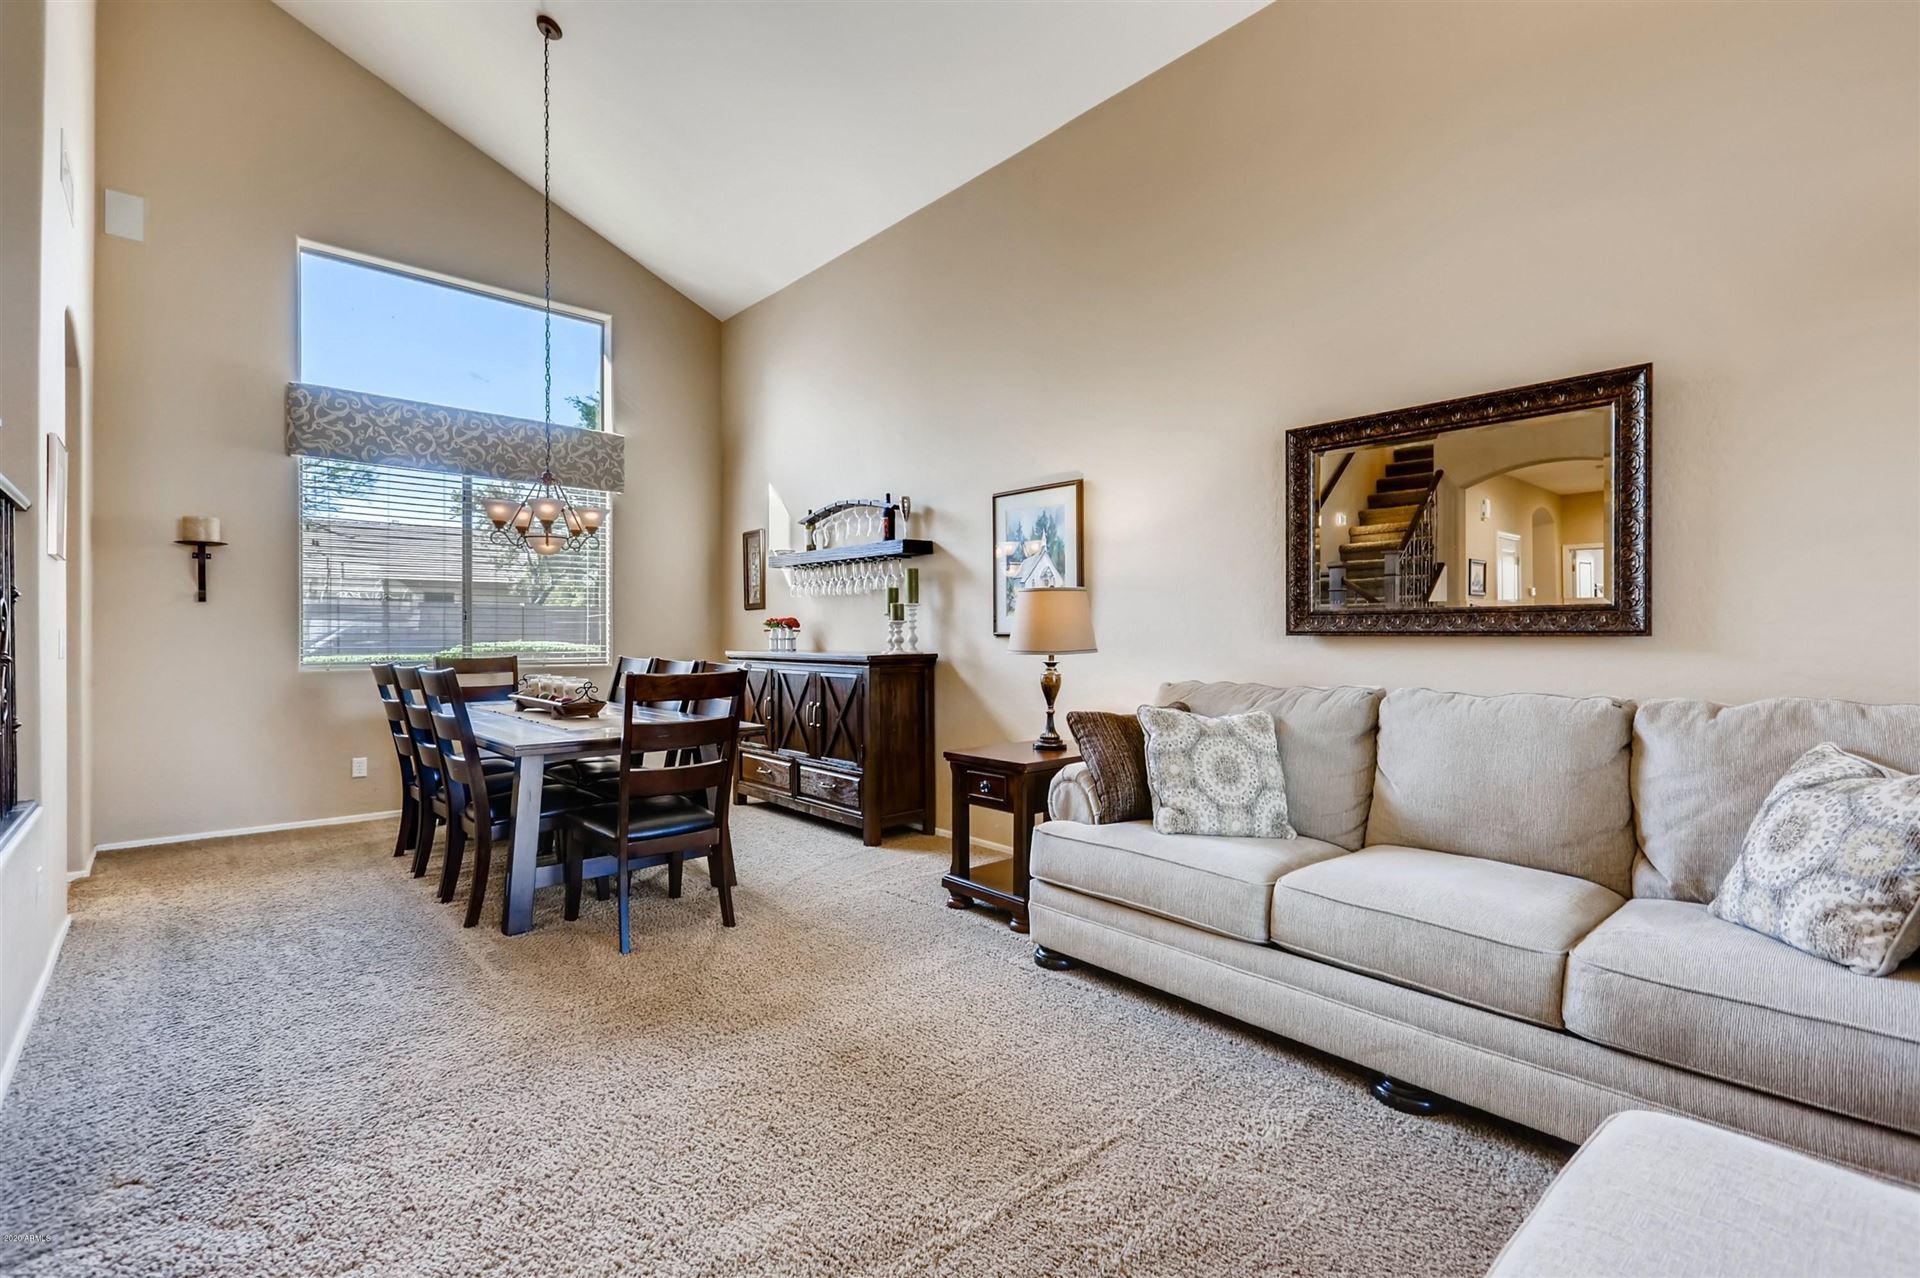 7324 E Mallory Circle Mesa Az 85207 Mls 6106179 Tru Realty A Phoenix Real Estate Company